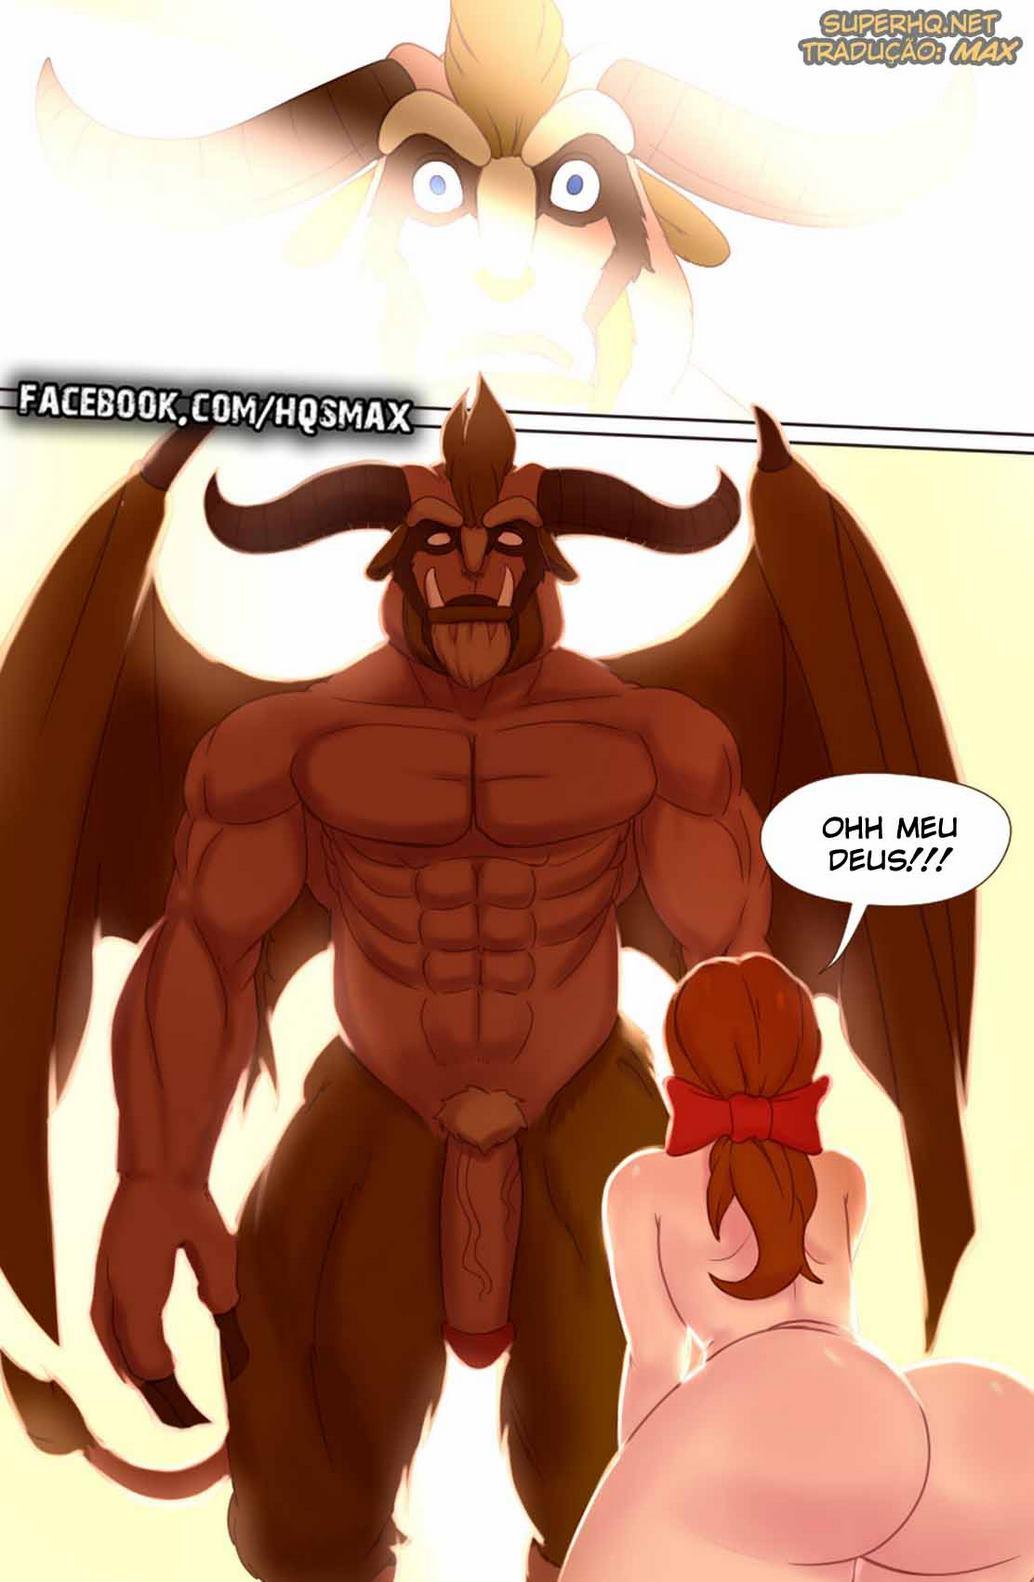 A Bela e a Fera - Hentai